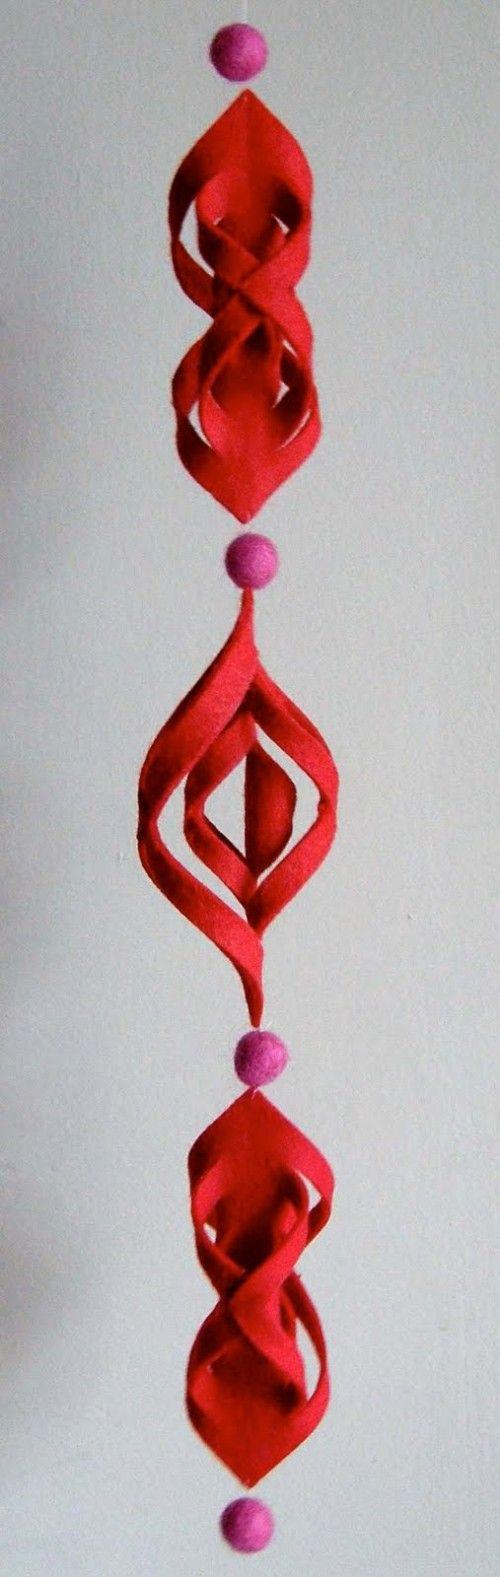 Modern DIY Felt Ornament by Betz White: Here is the link for the tutorial http://tinyurl.com/yd48rfe  #Felt #Ornament #Betx_White